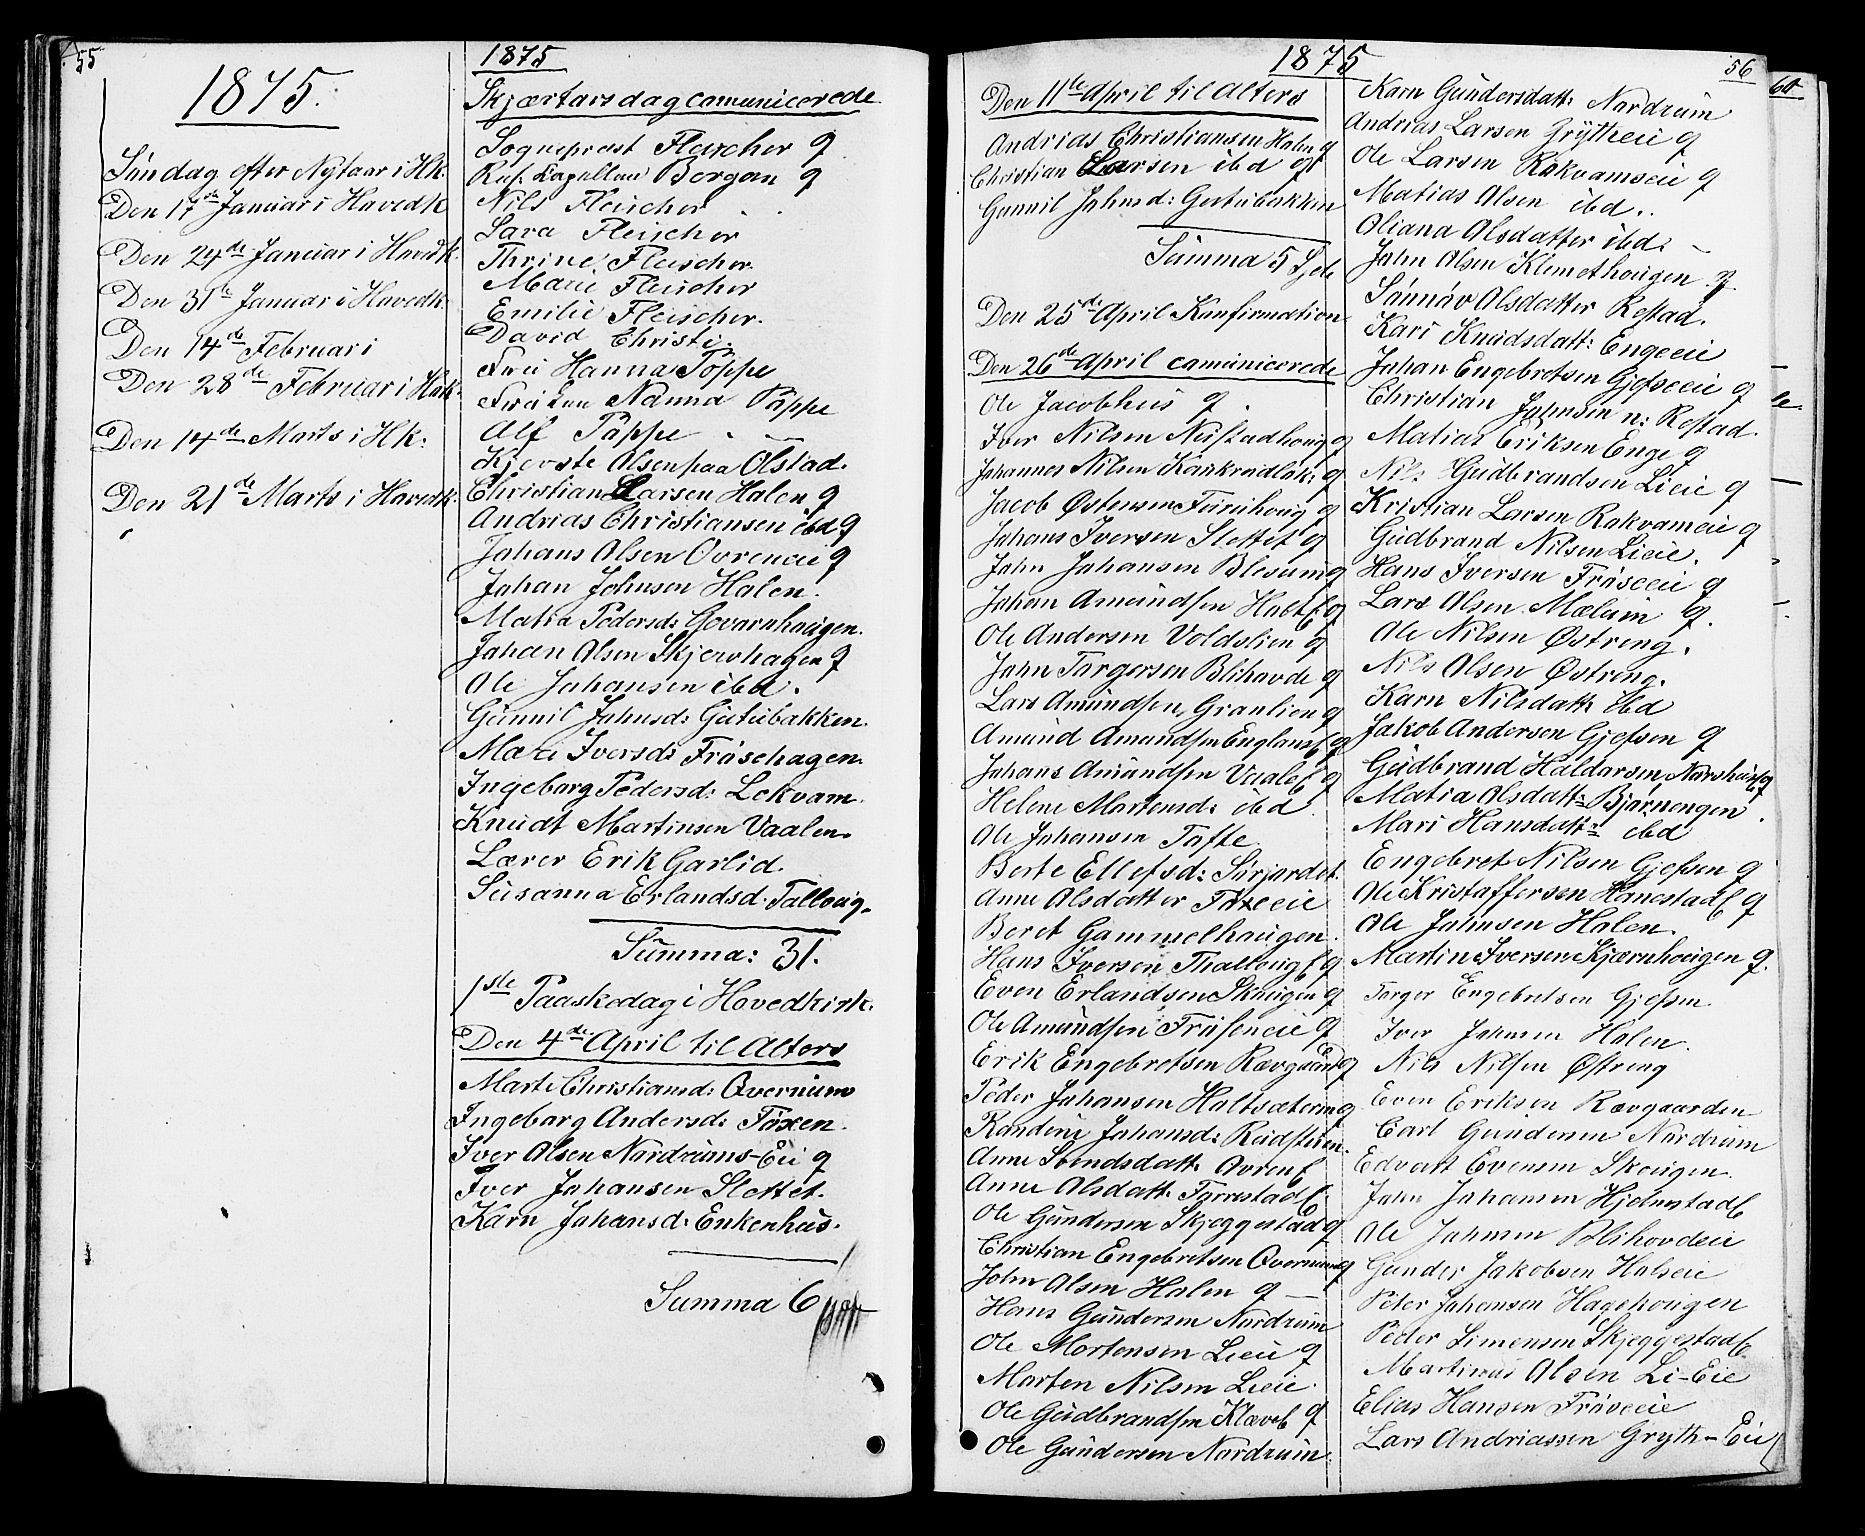 SAH, Østre Gausdal prestekontor, Klokkerbok nr. 1, 1863-1893, s. 55-56